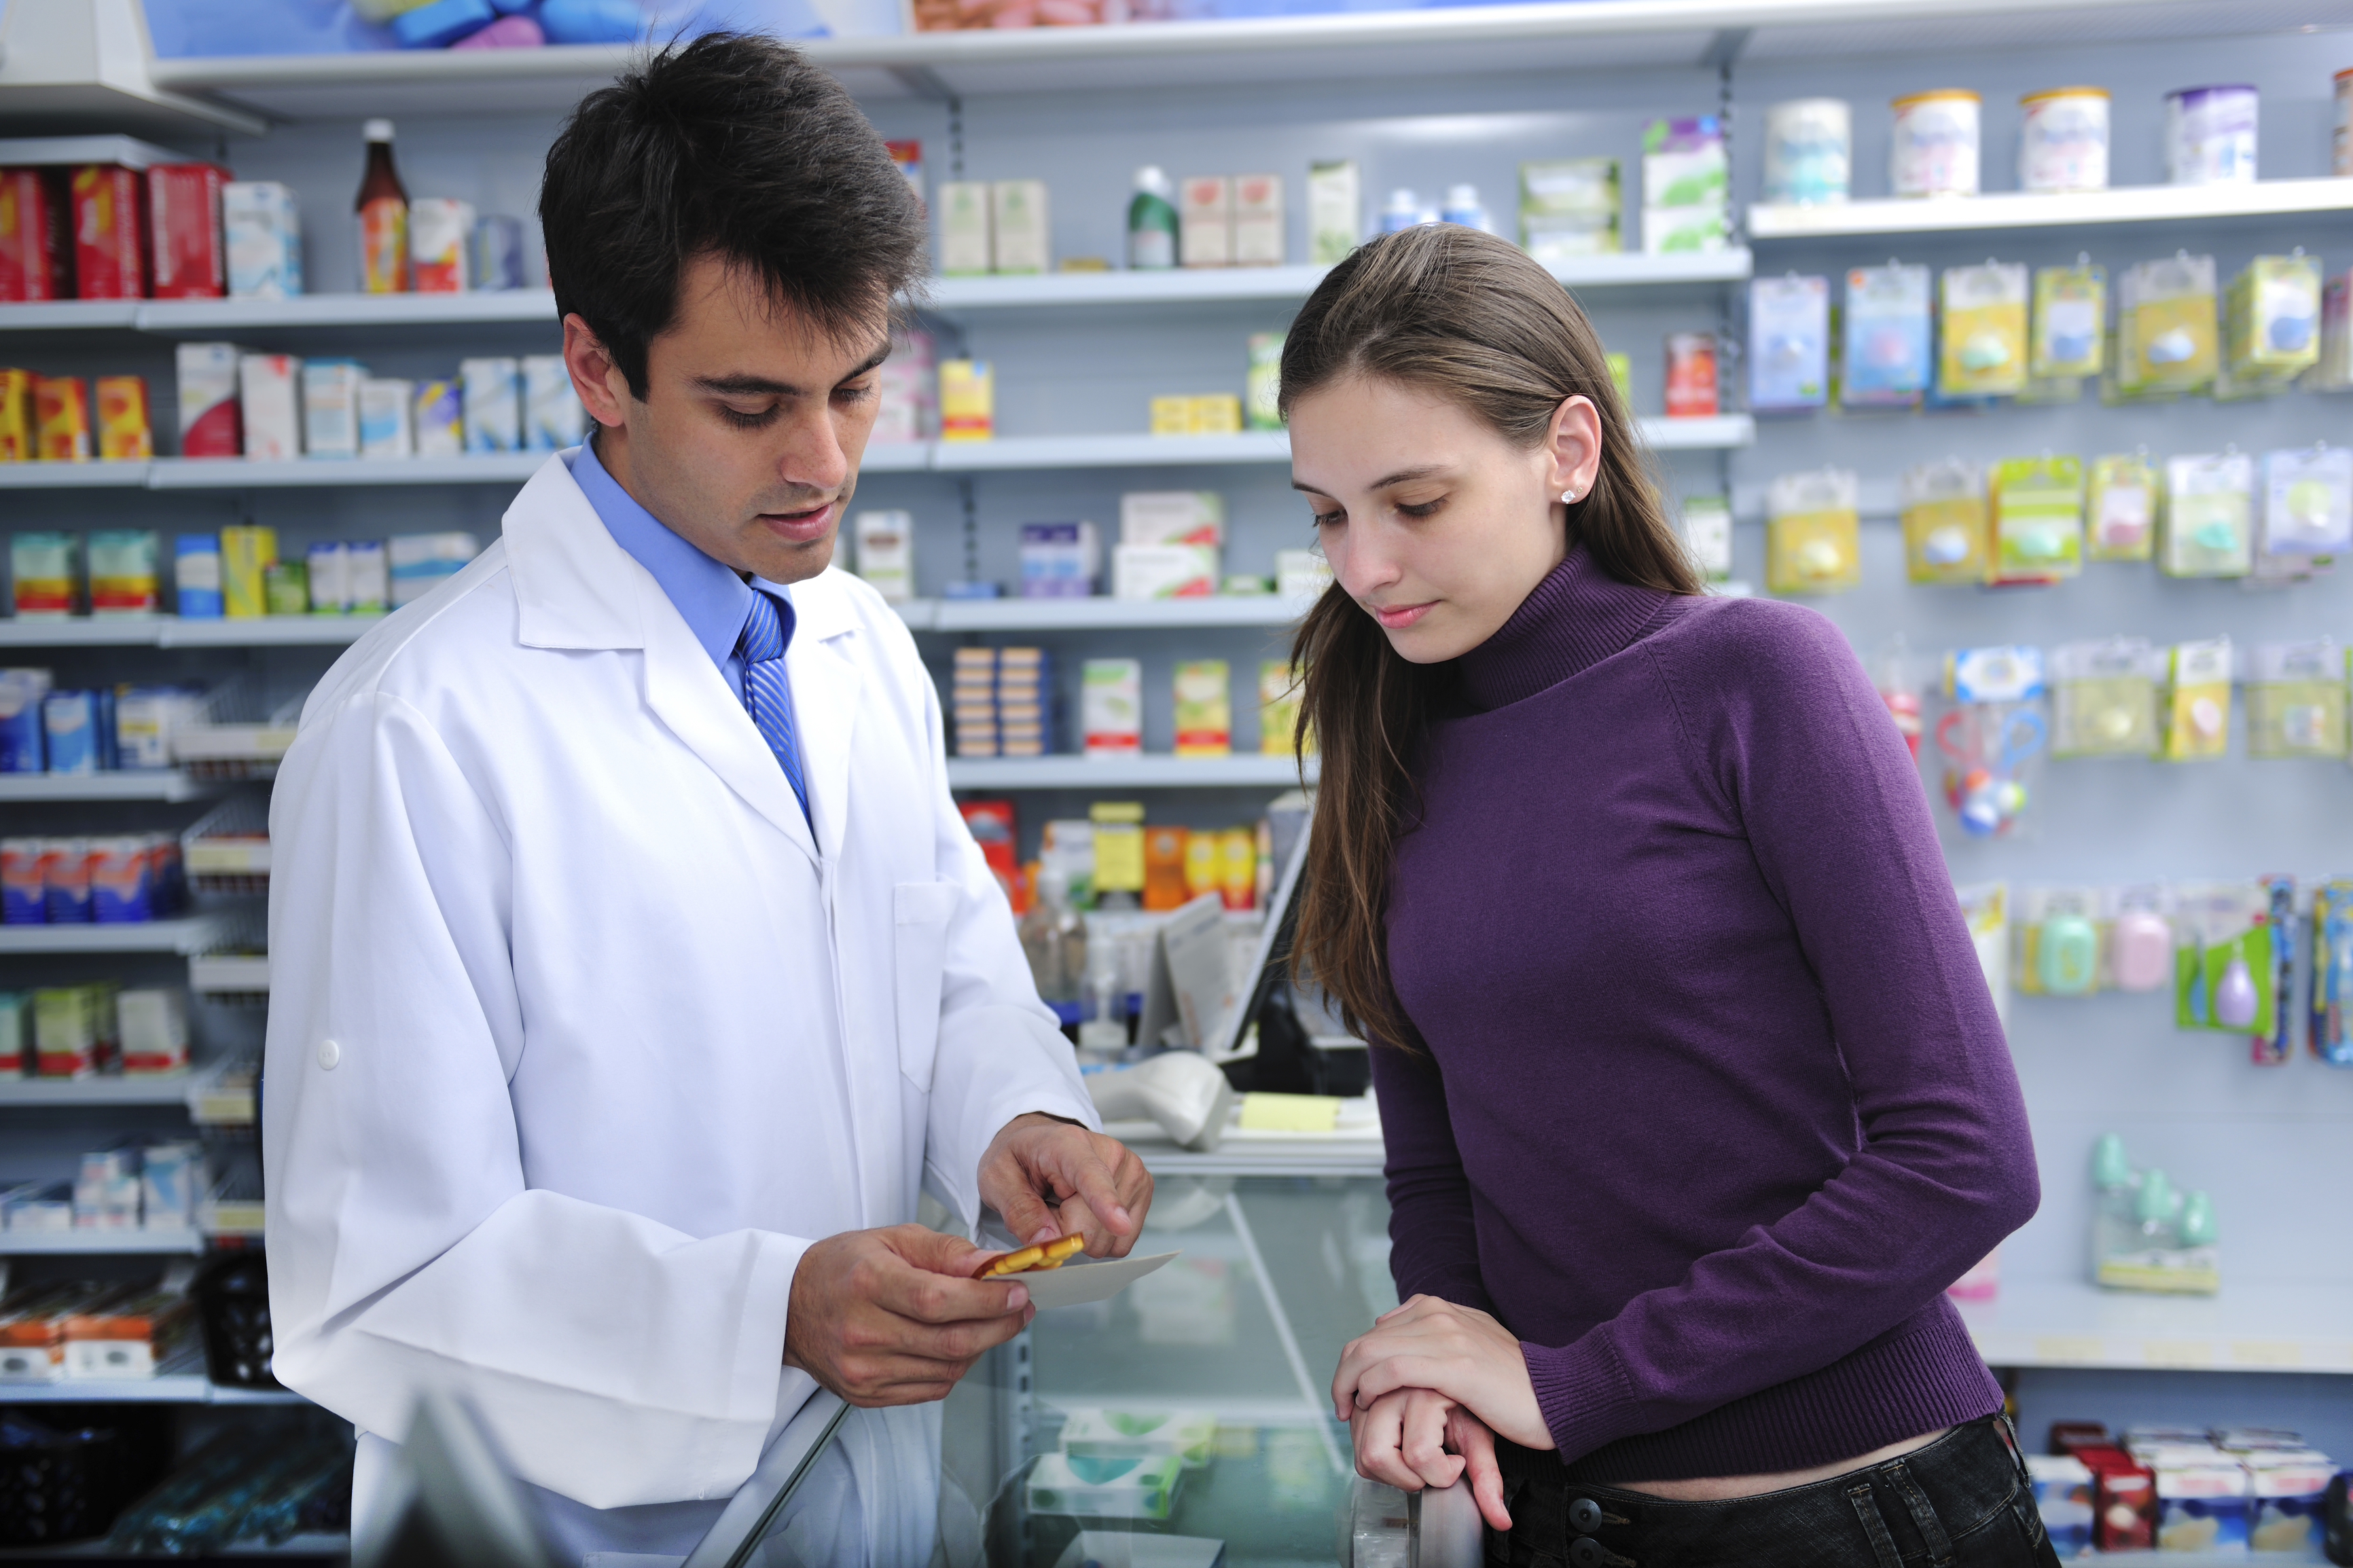 Where Pharmacy Meets Family.